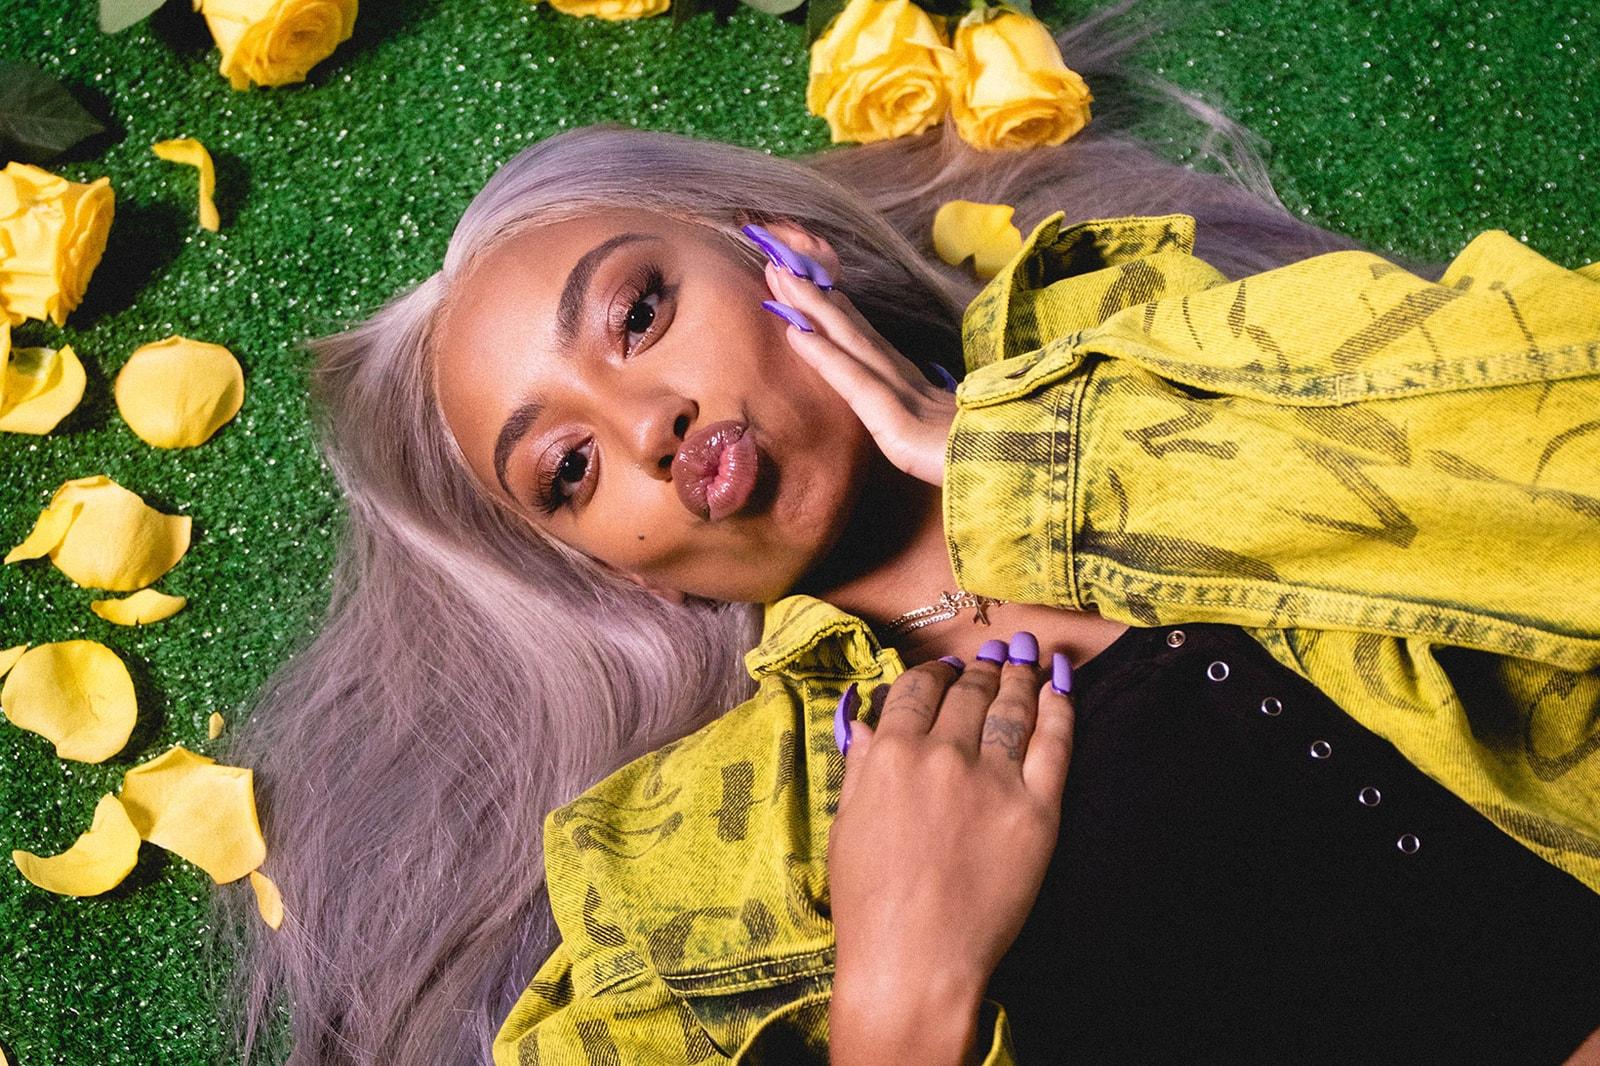 black history month women female representation diversity inclusion music artist performer singer kiana lede abby jasmine mahalia muni long